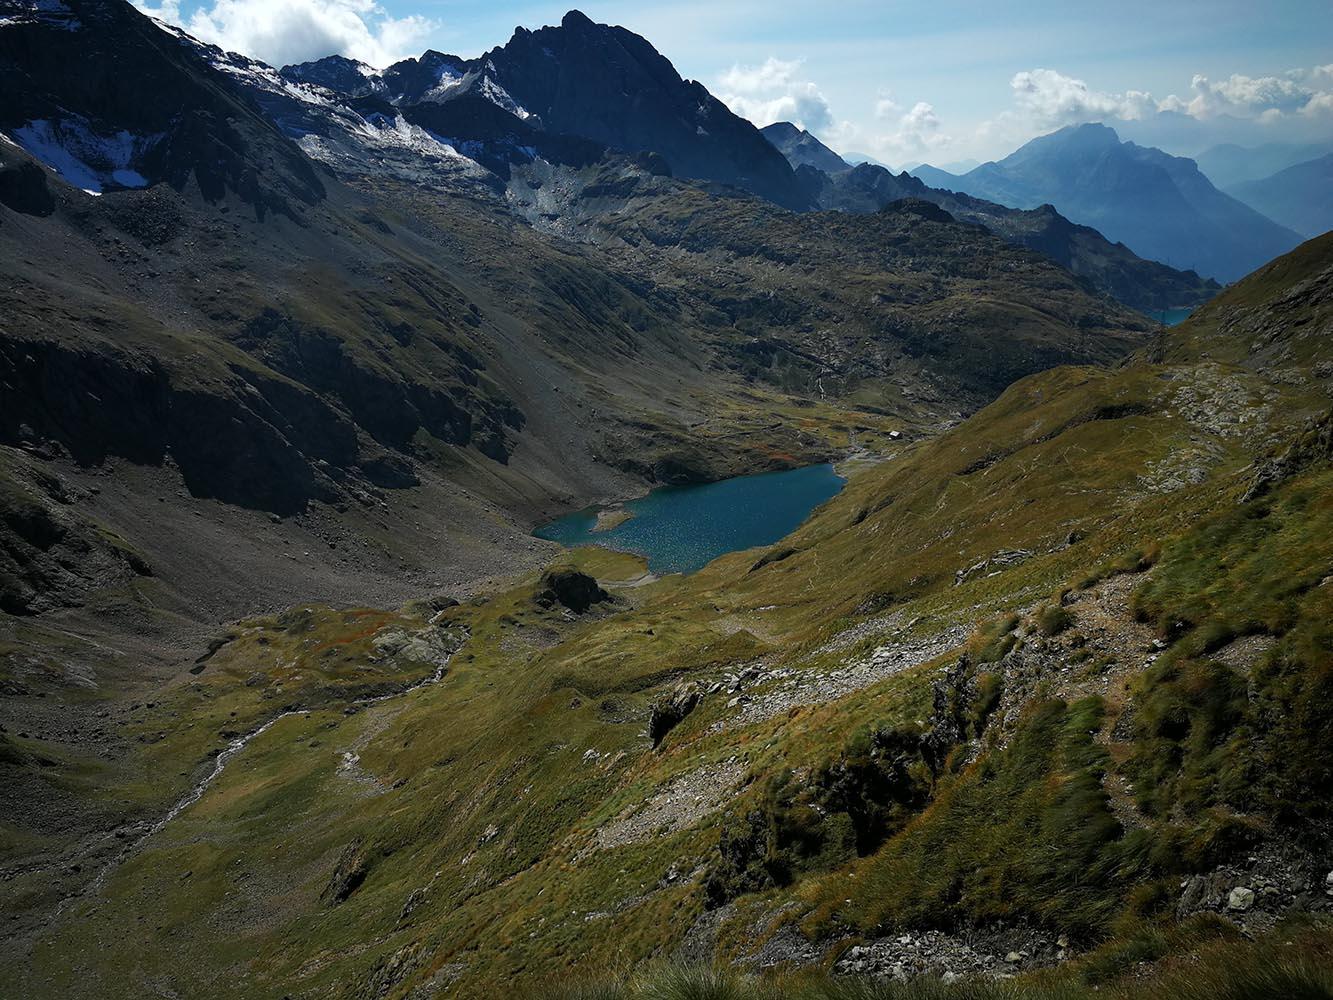 lago barbellino naturale orobie